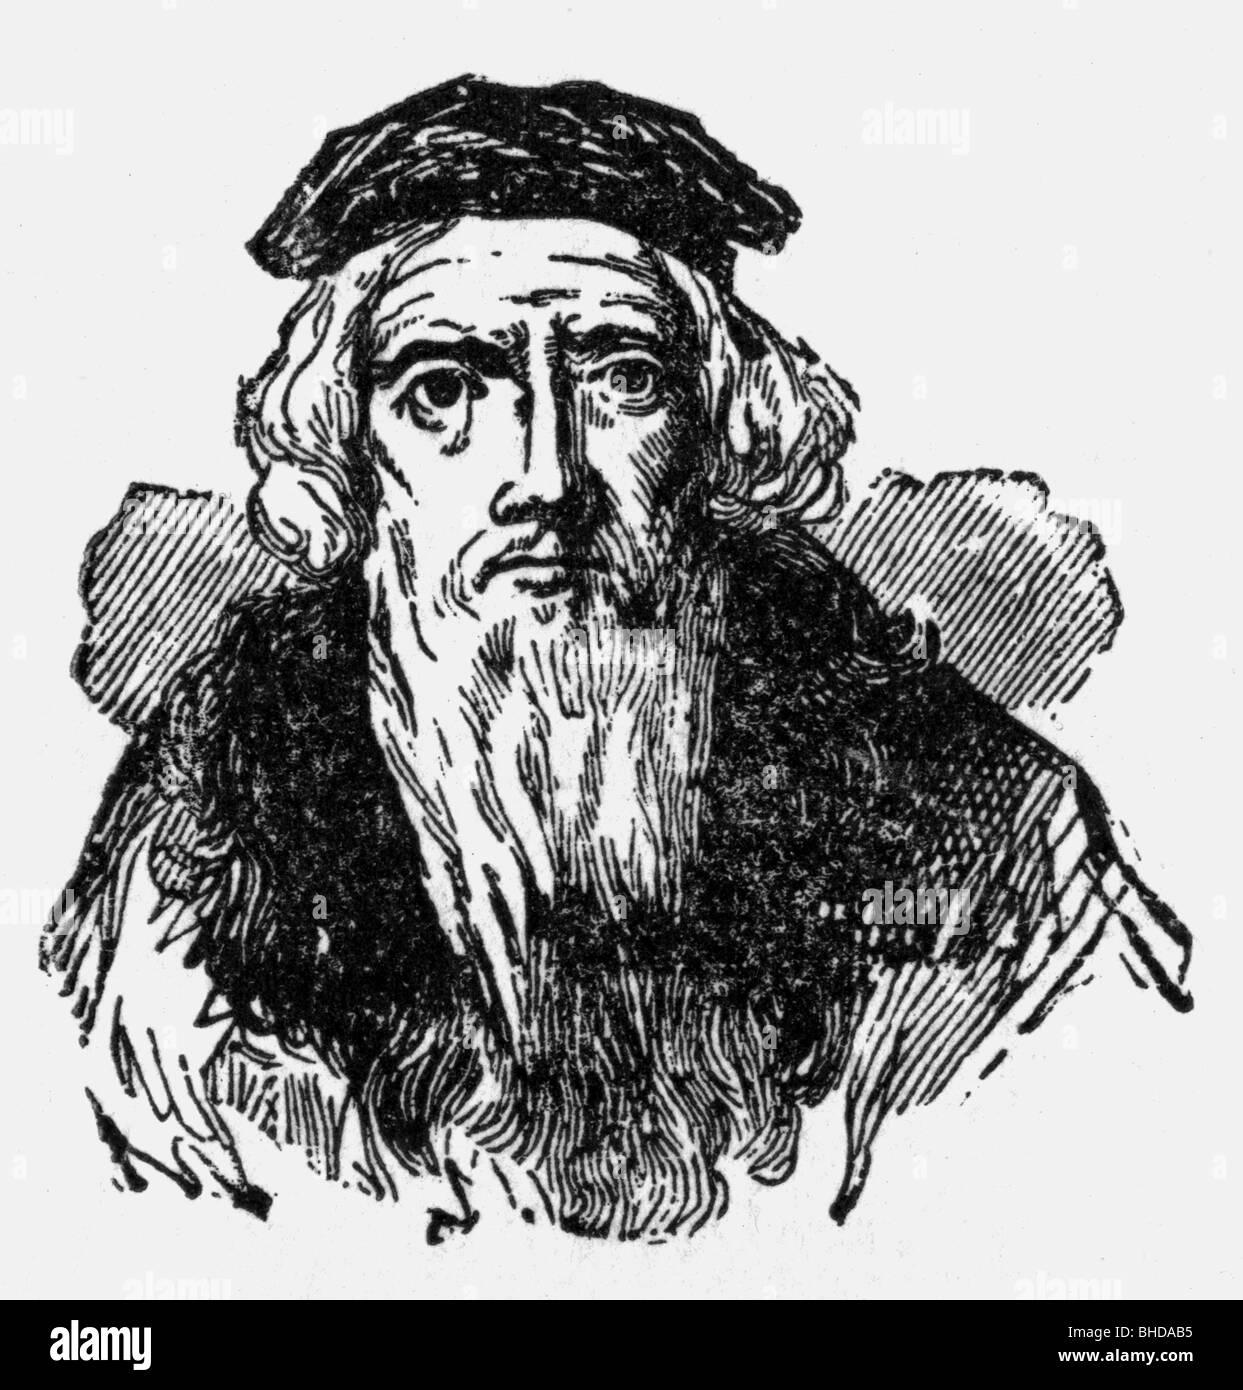 Cabot, Sebastian (Caboto), 1472/1884 - 1557, Italian navigator, explorer, portrait, Additional-Rights-Clearances - Stock Image